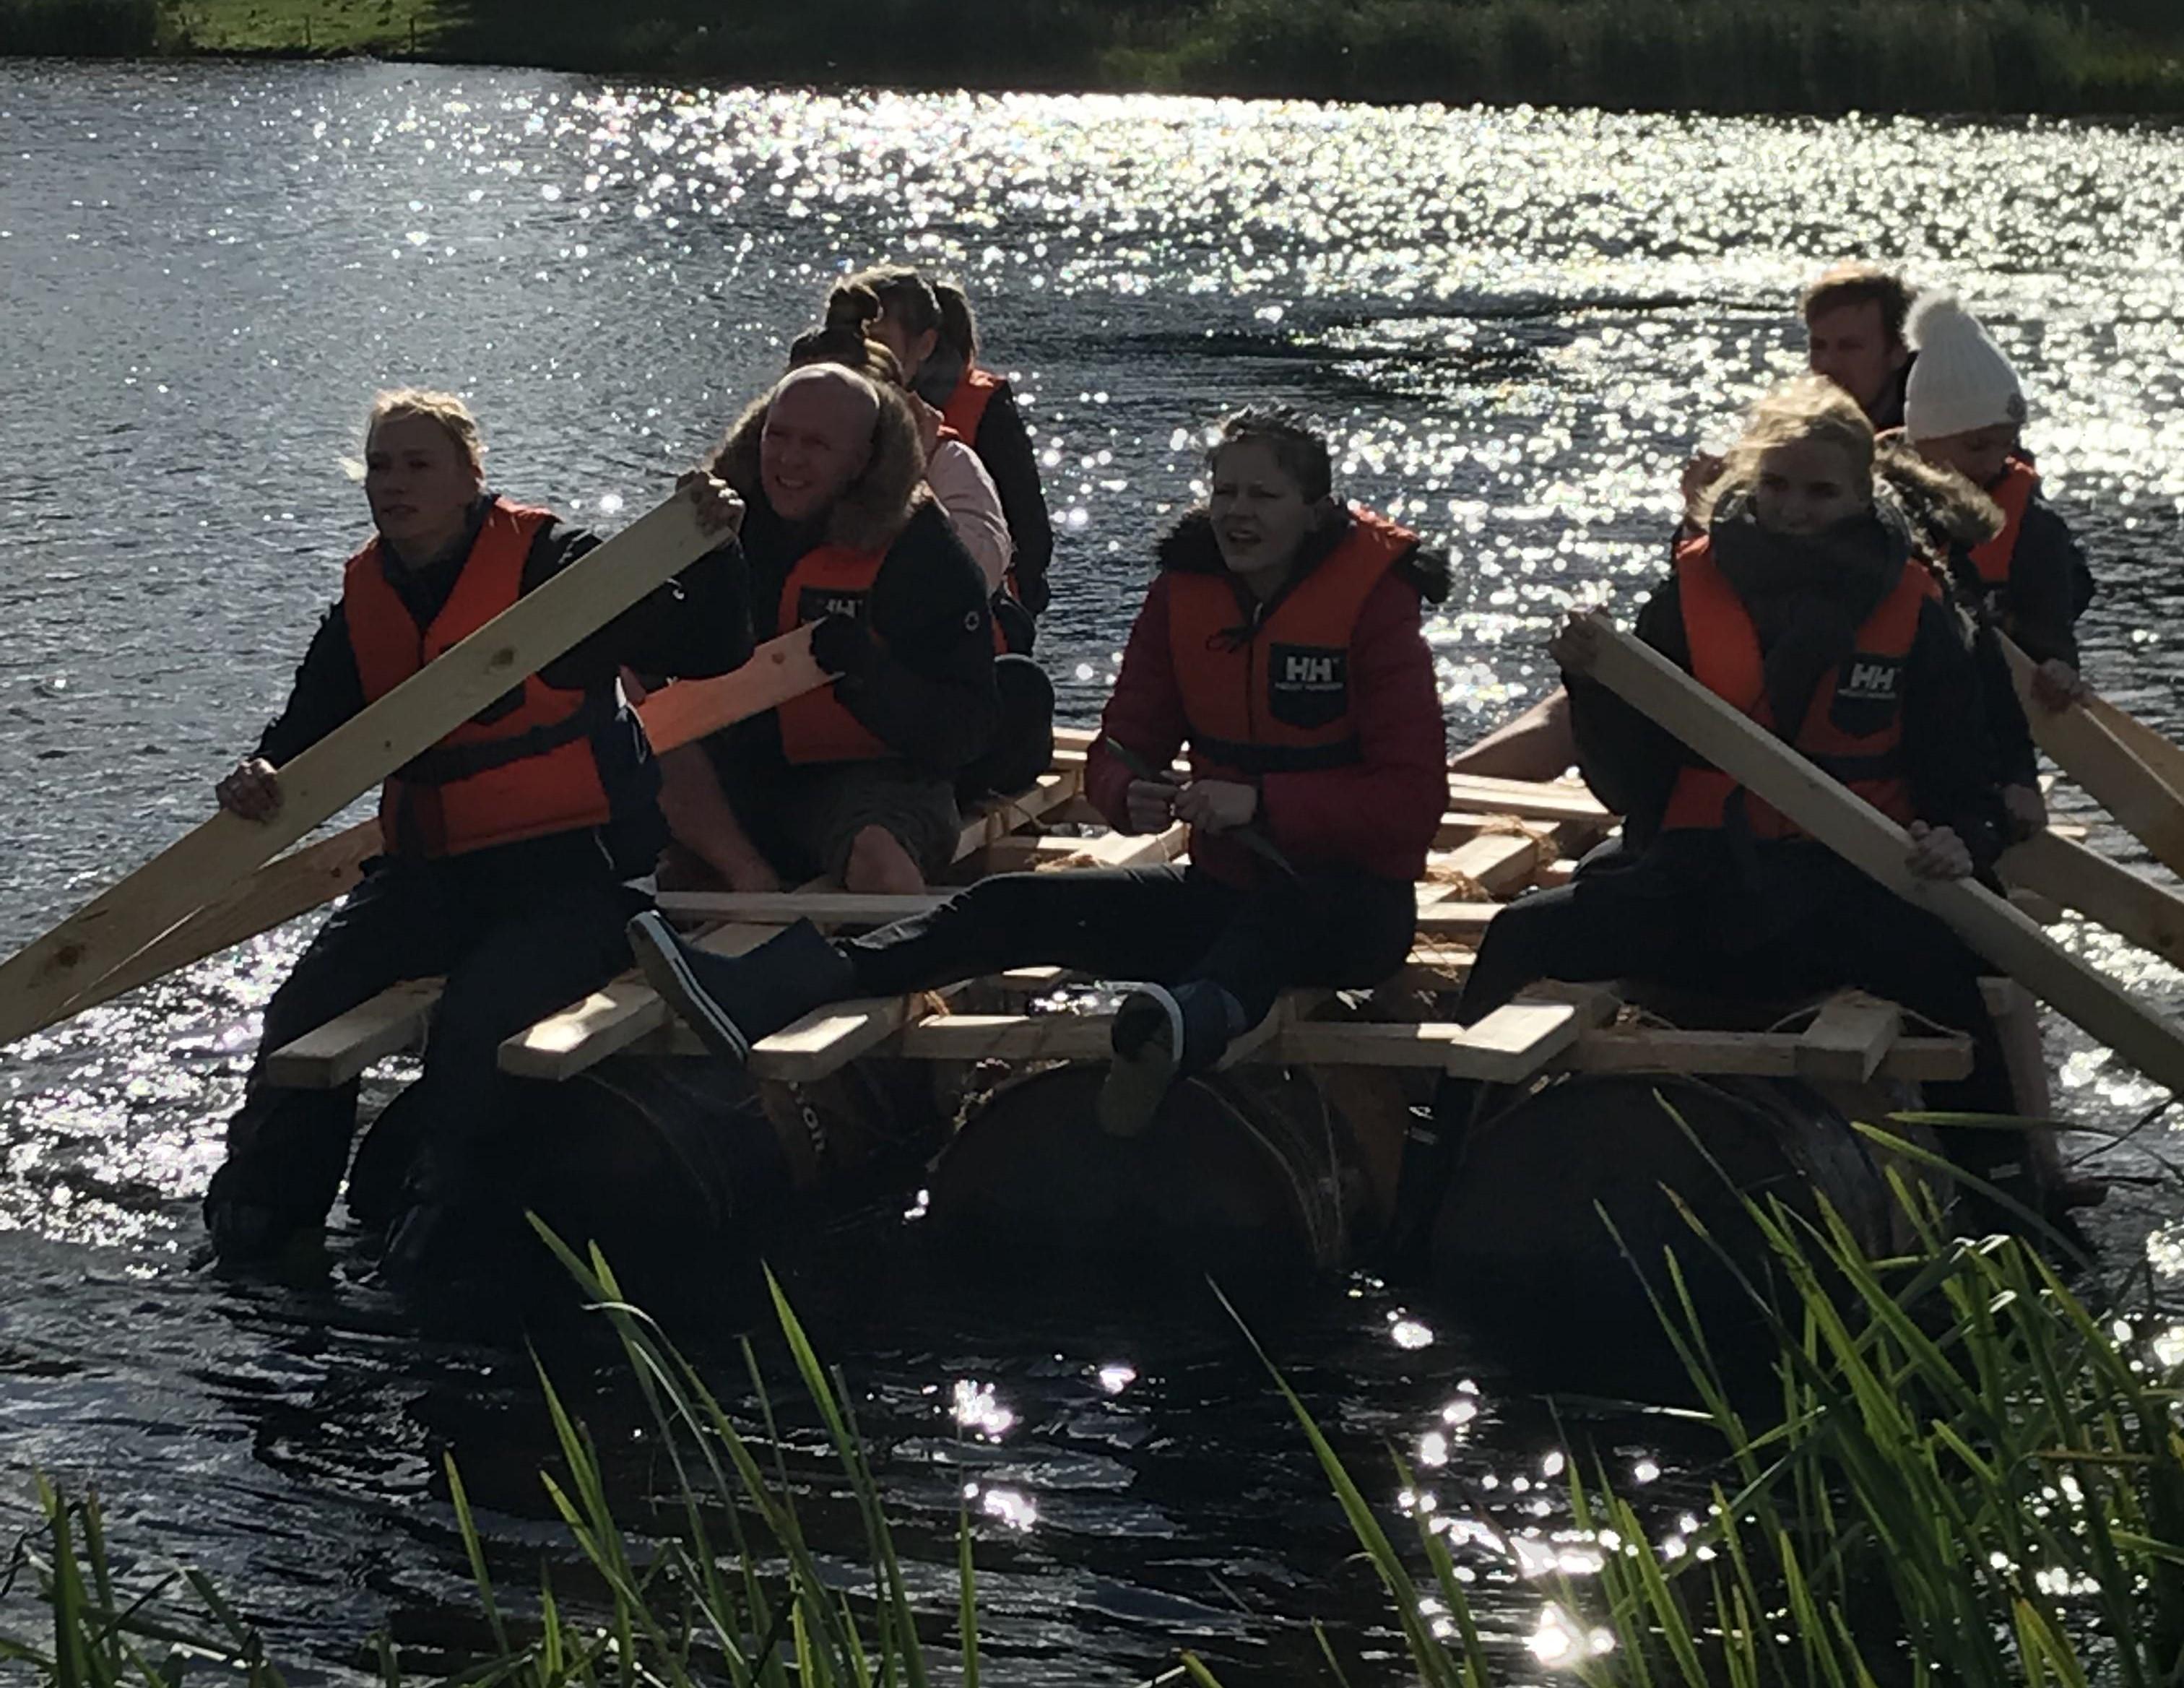 Kursister i vandet med selvkonstrueret tømmerflåde.